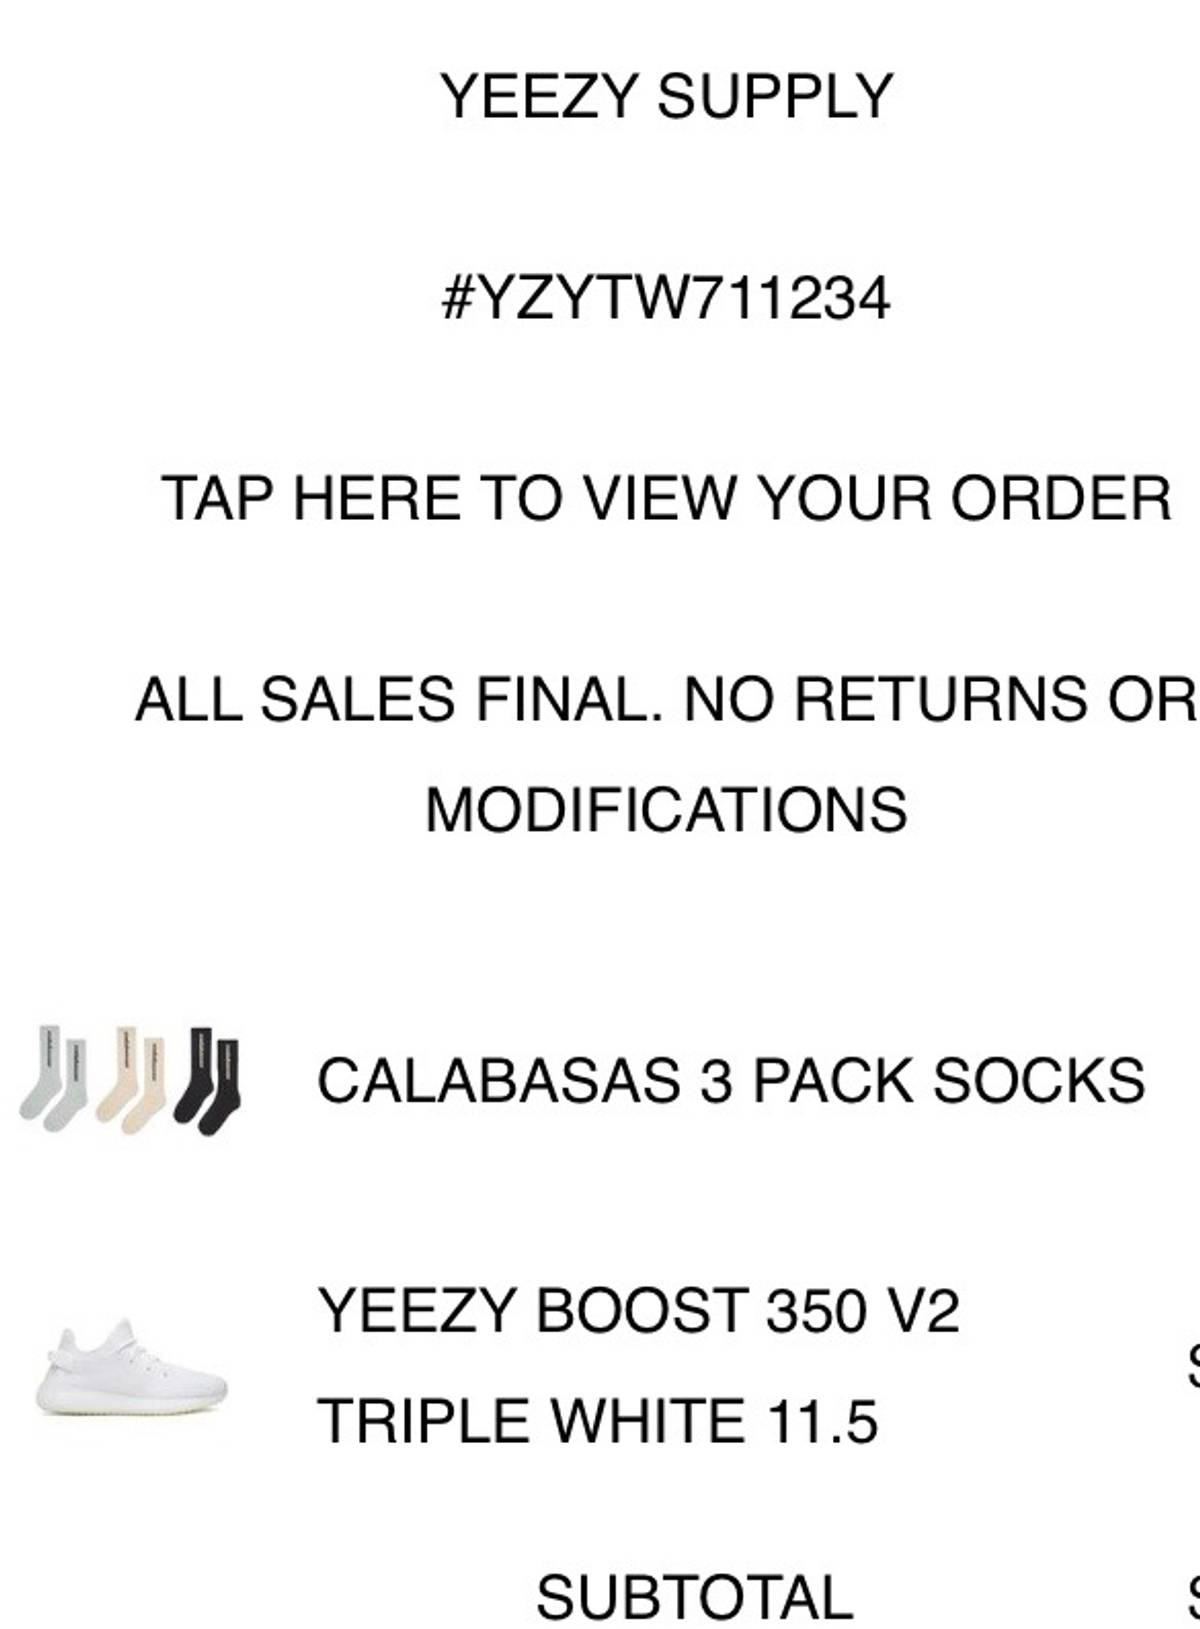 84924b285 Adidas Kanye West 🔥gotta Get Gone-under Retail! ! Yeezy Boost 350 V2  Triple White Plus 3-pack Of Calabasas Socks   Free Us Shipping!!🔥